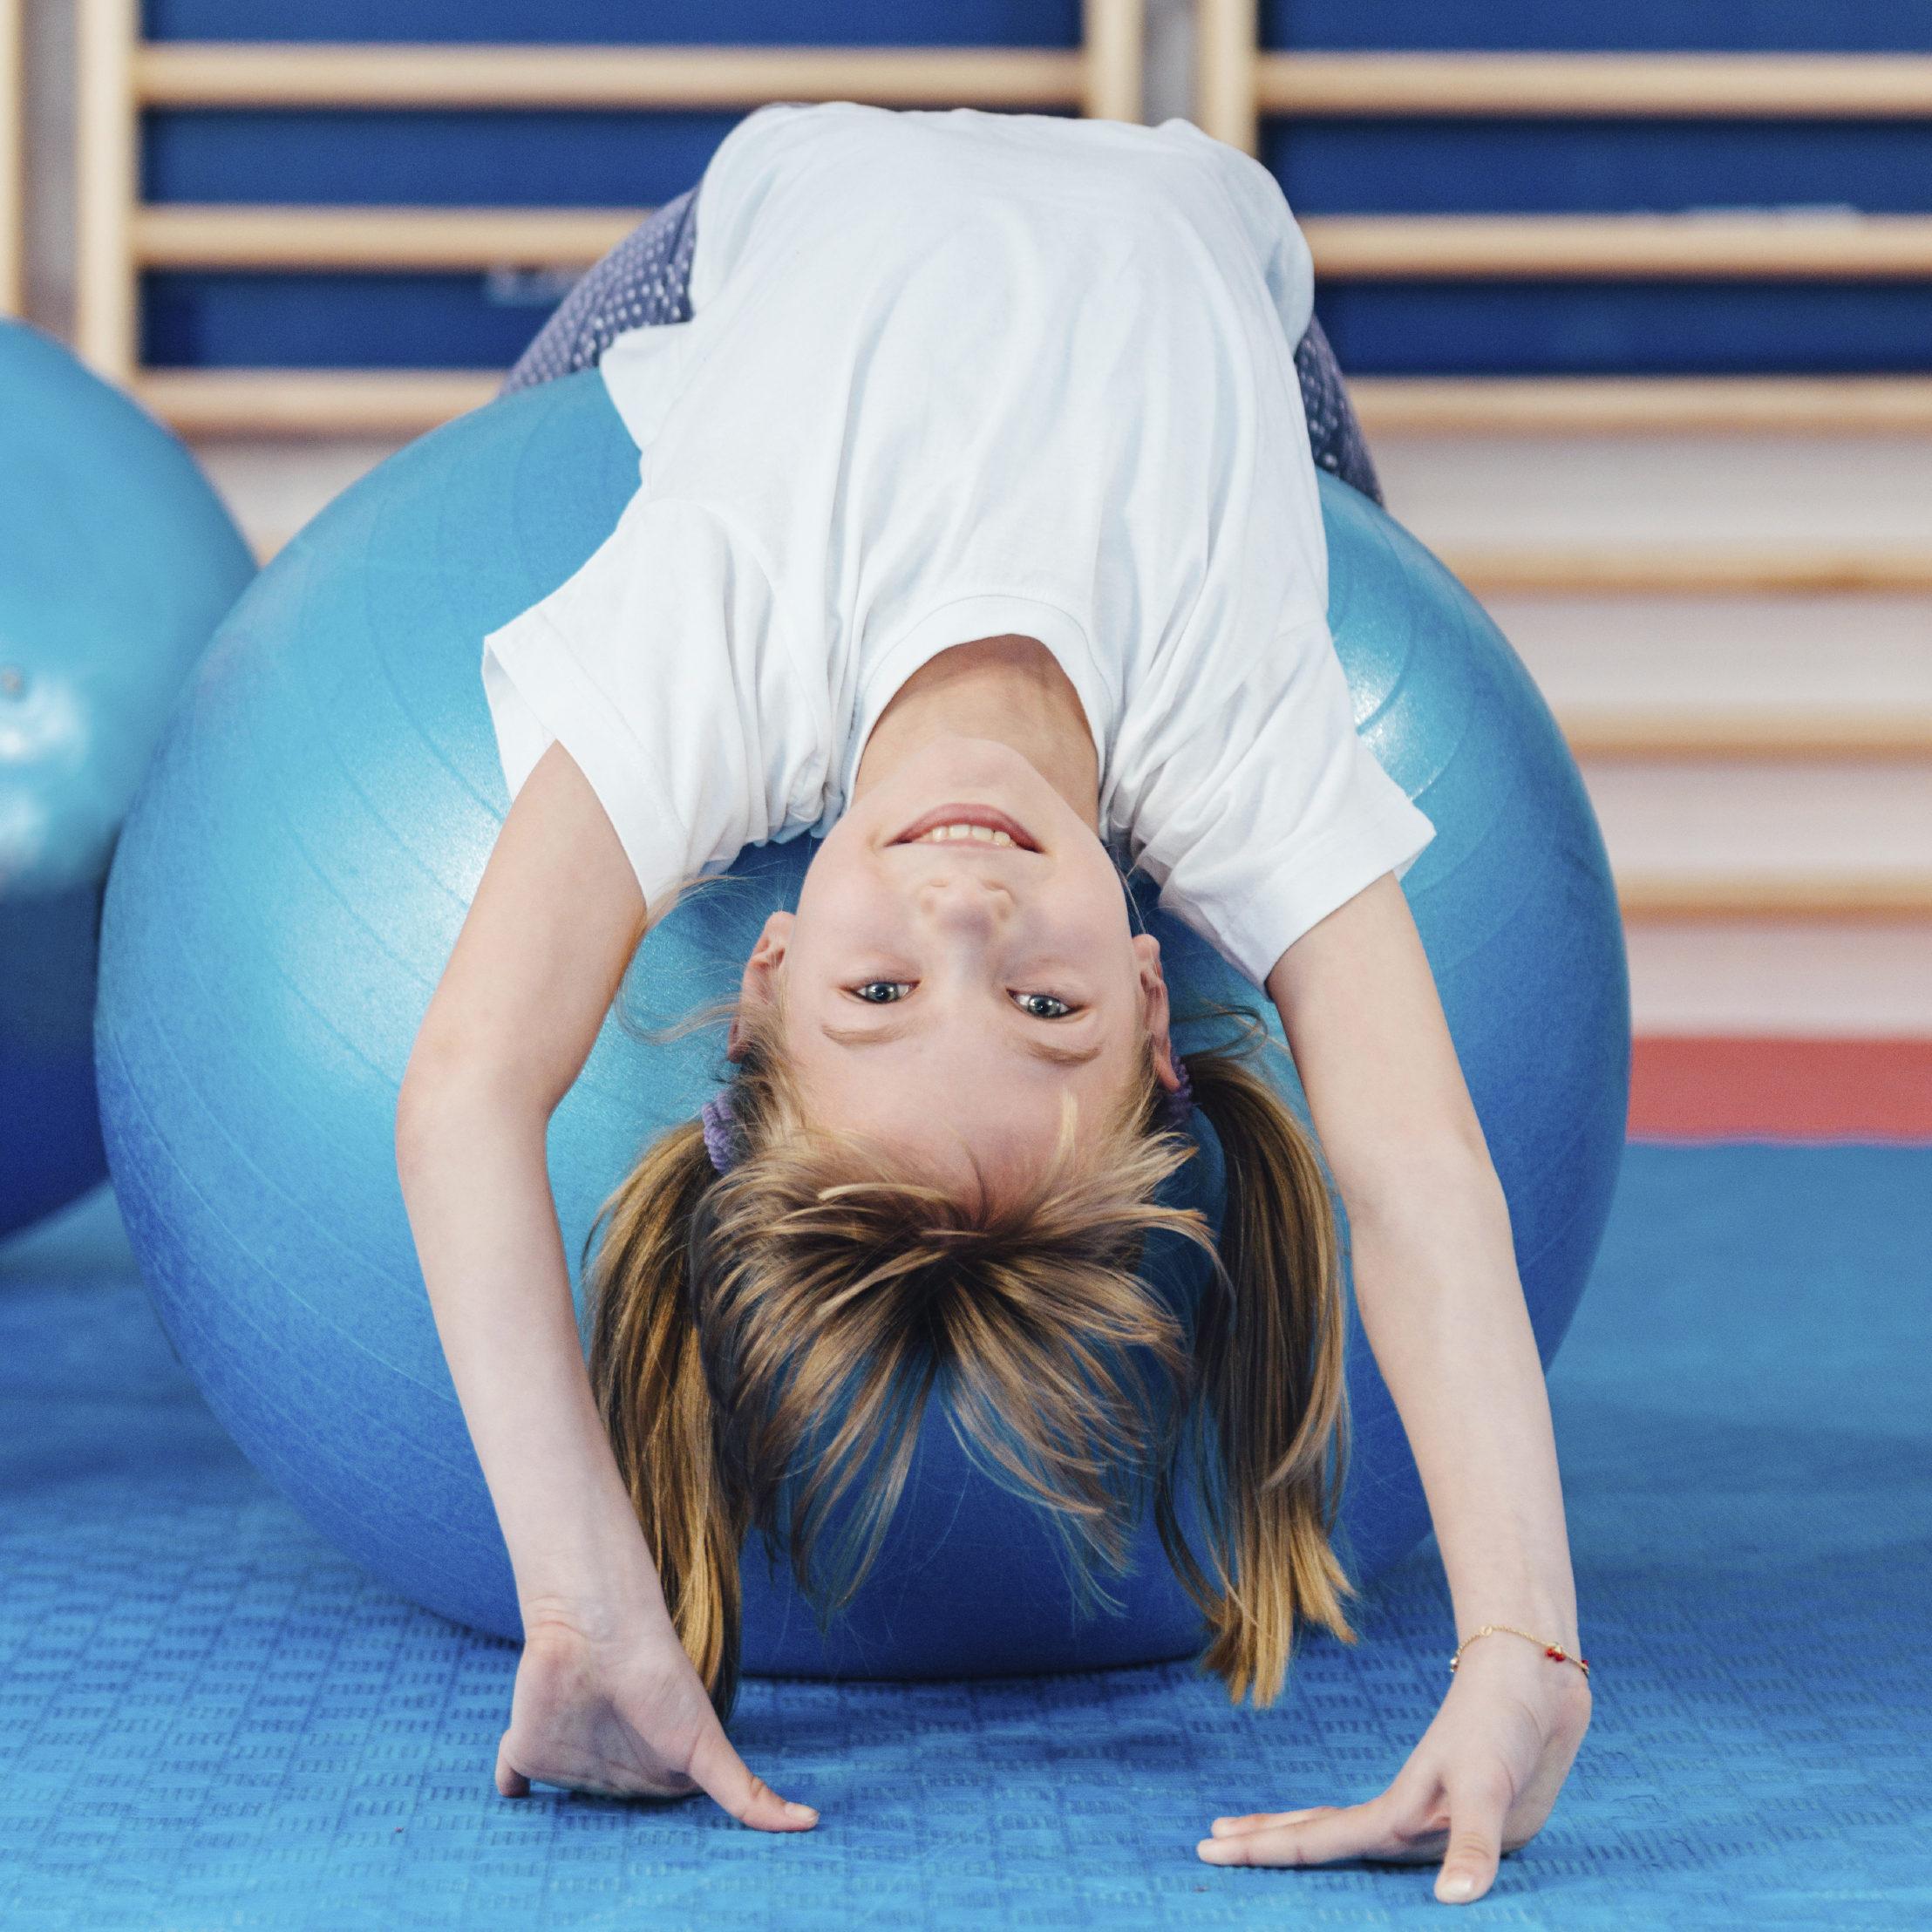 Cute girl exercising on pilates ball